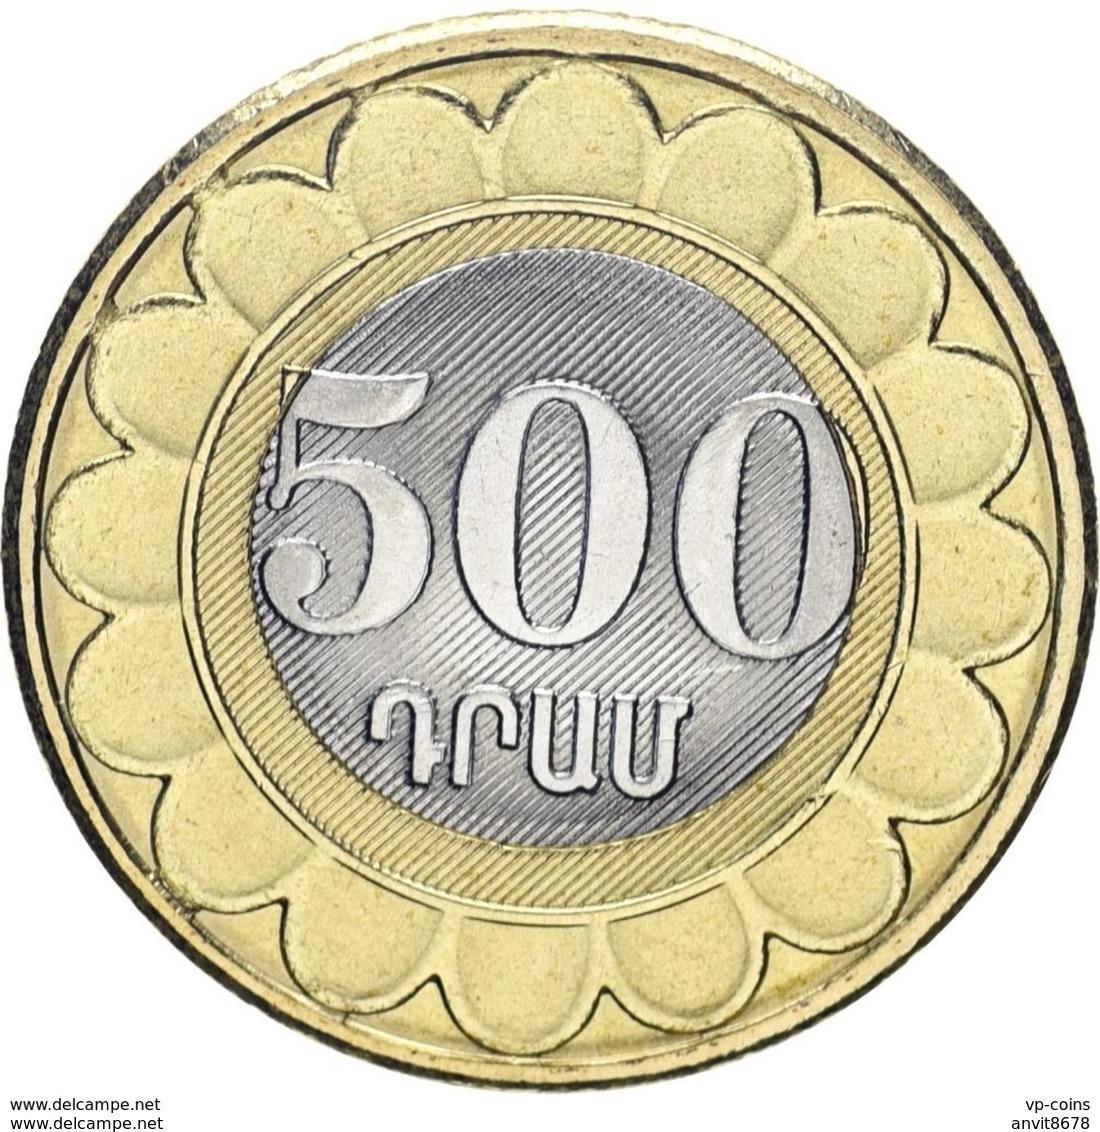 ARMENIA  500 DRAM  2003 UNC - Armenia